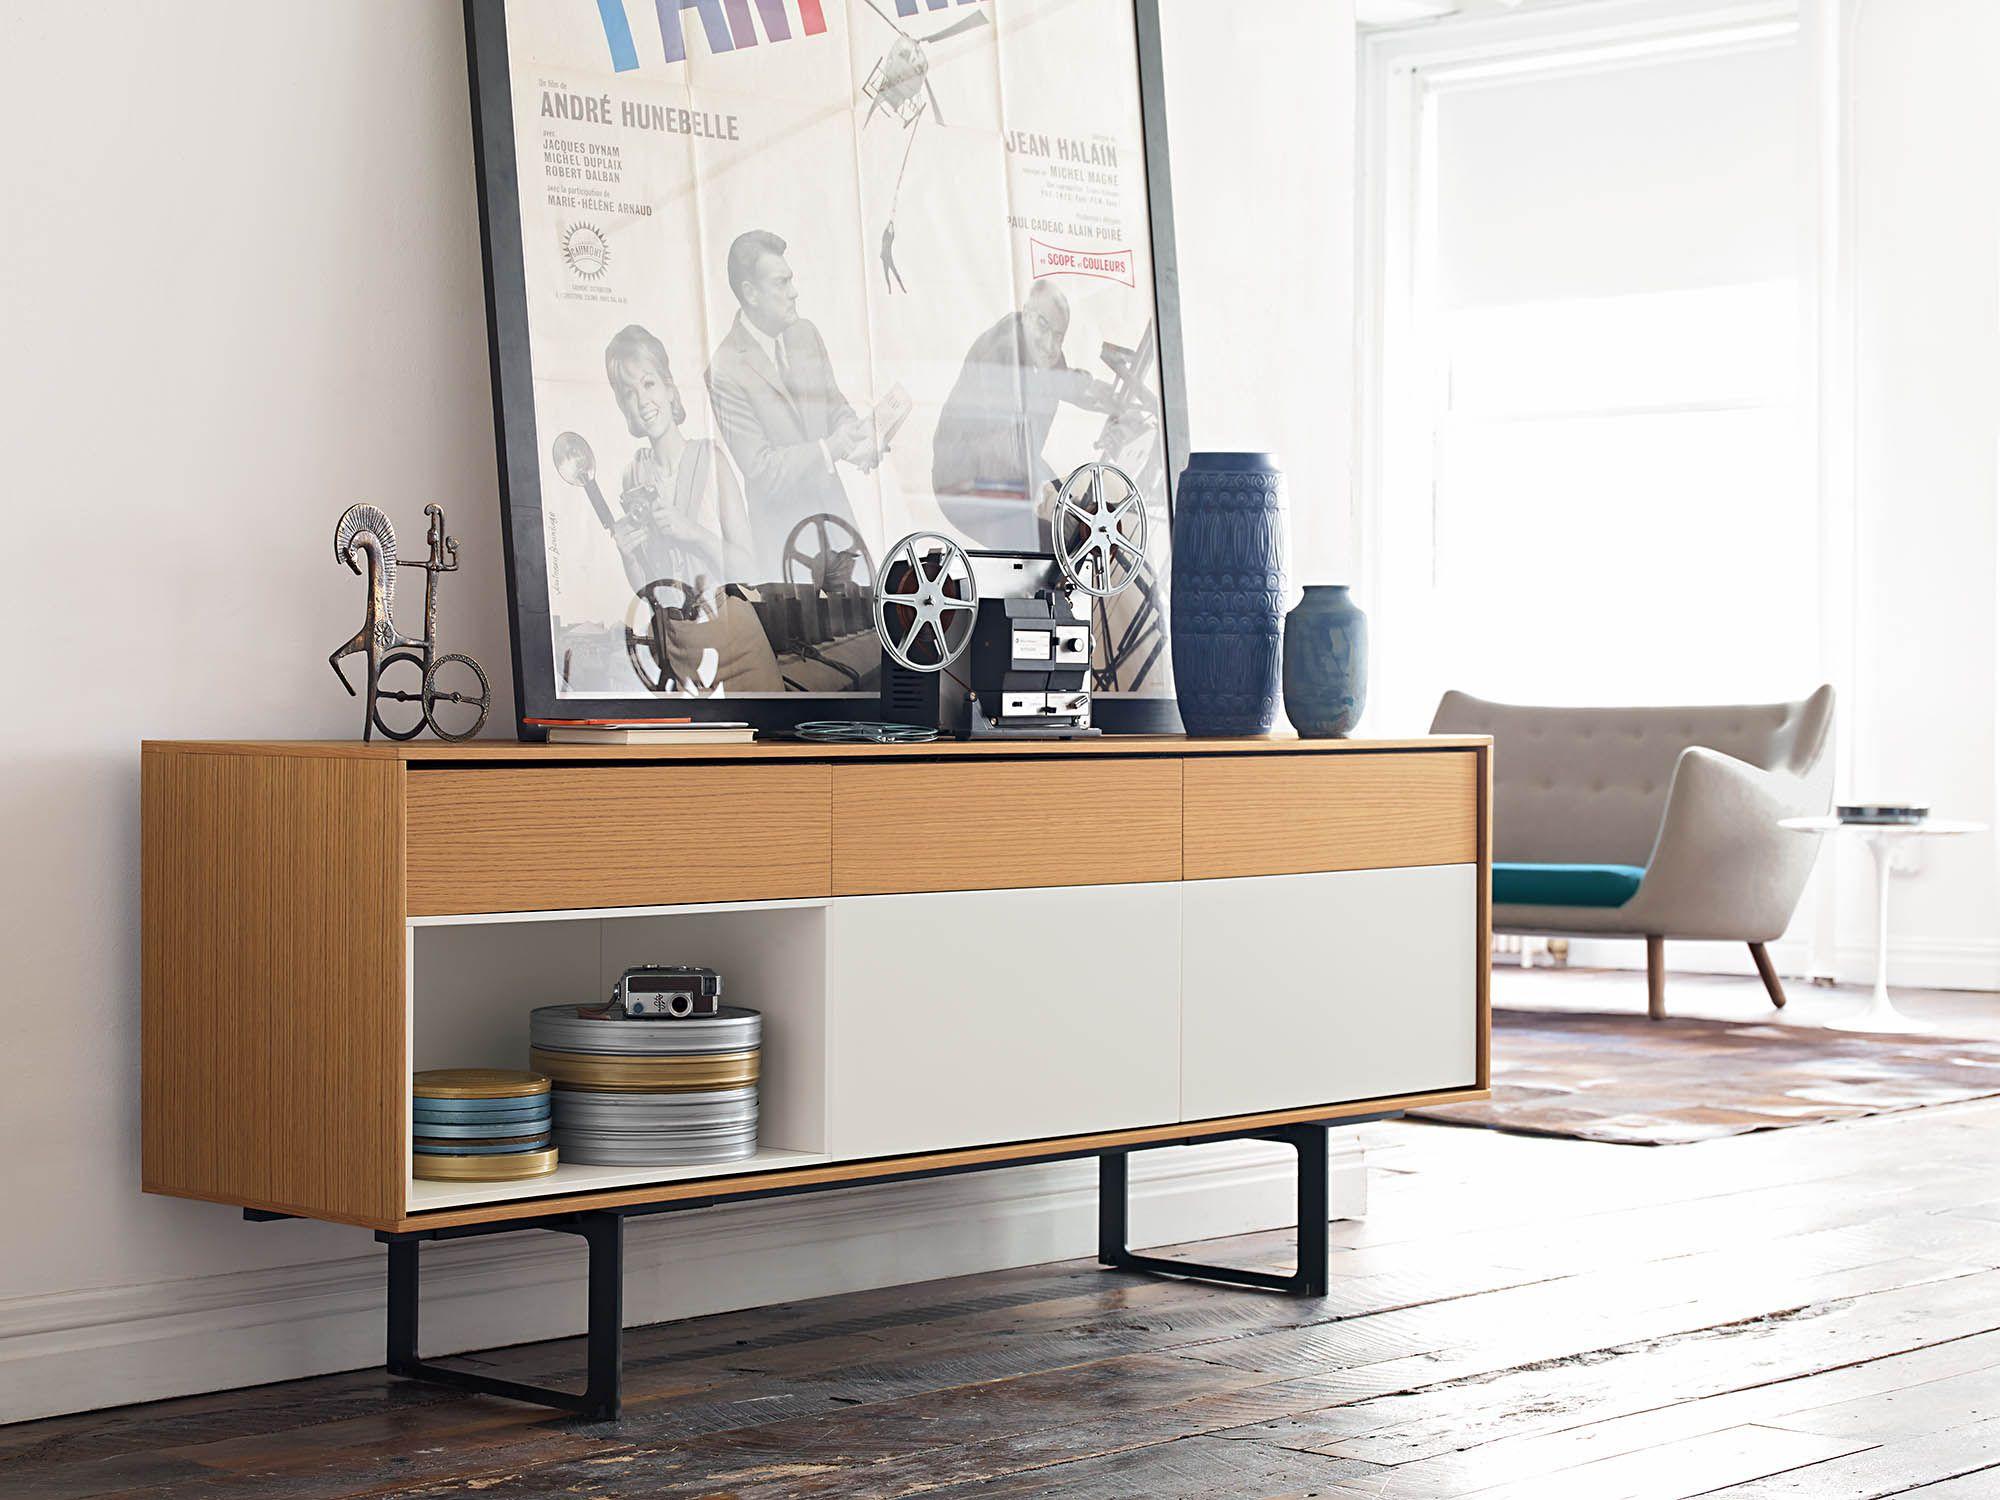 La Credenza Muebles : Aura credenza stay organized cabinet furniture modern storage